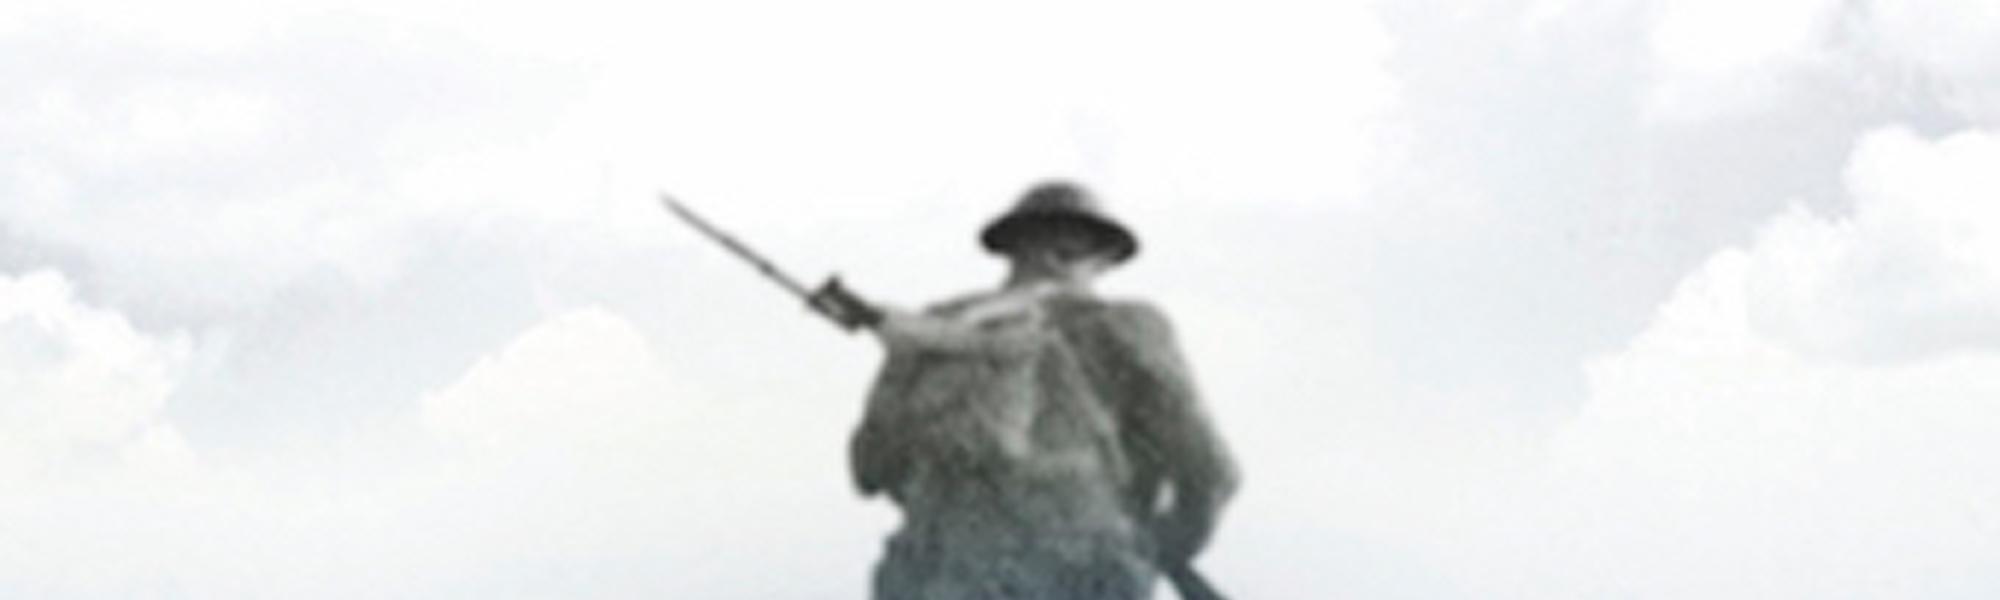 A soldier standing in a poppy field